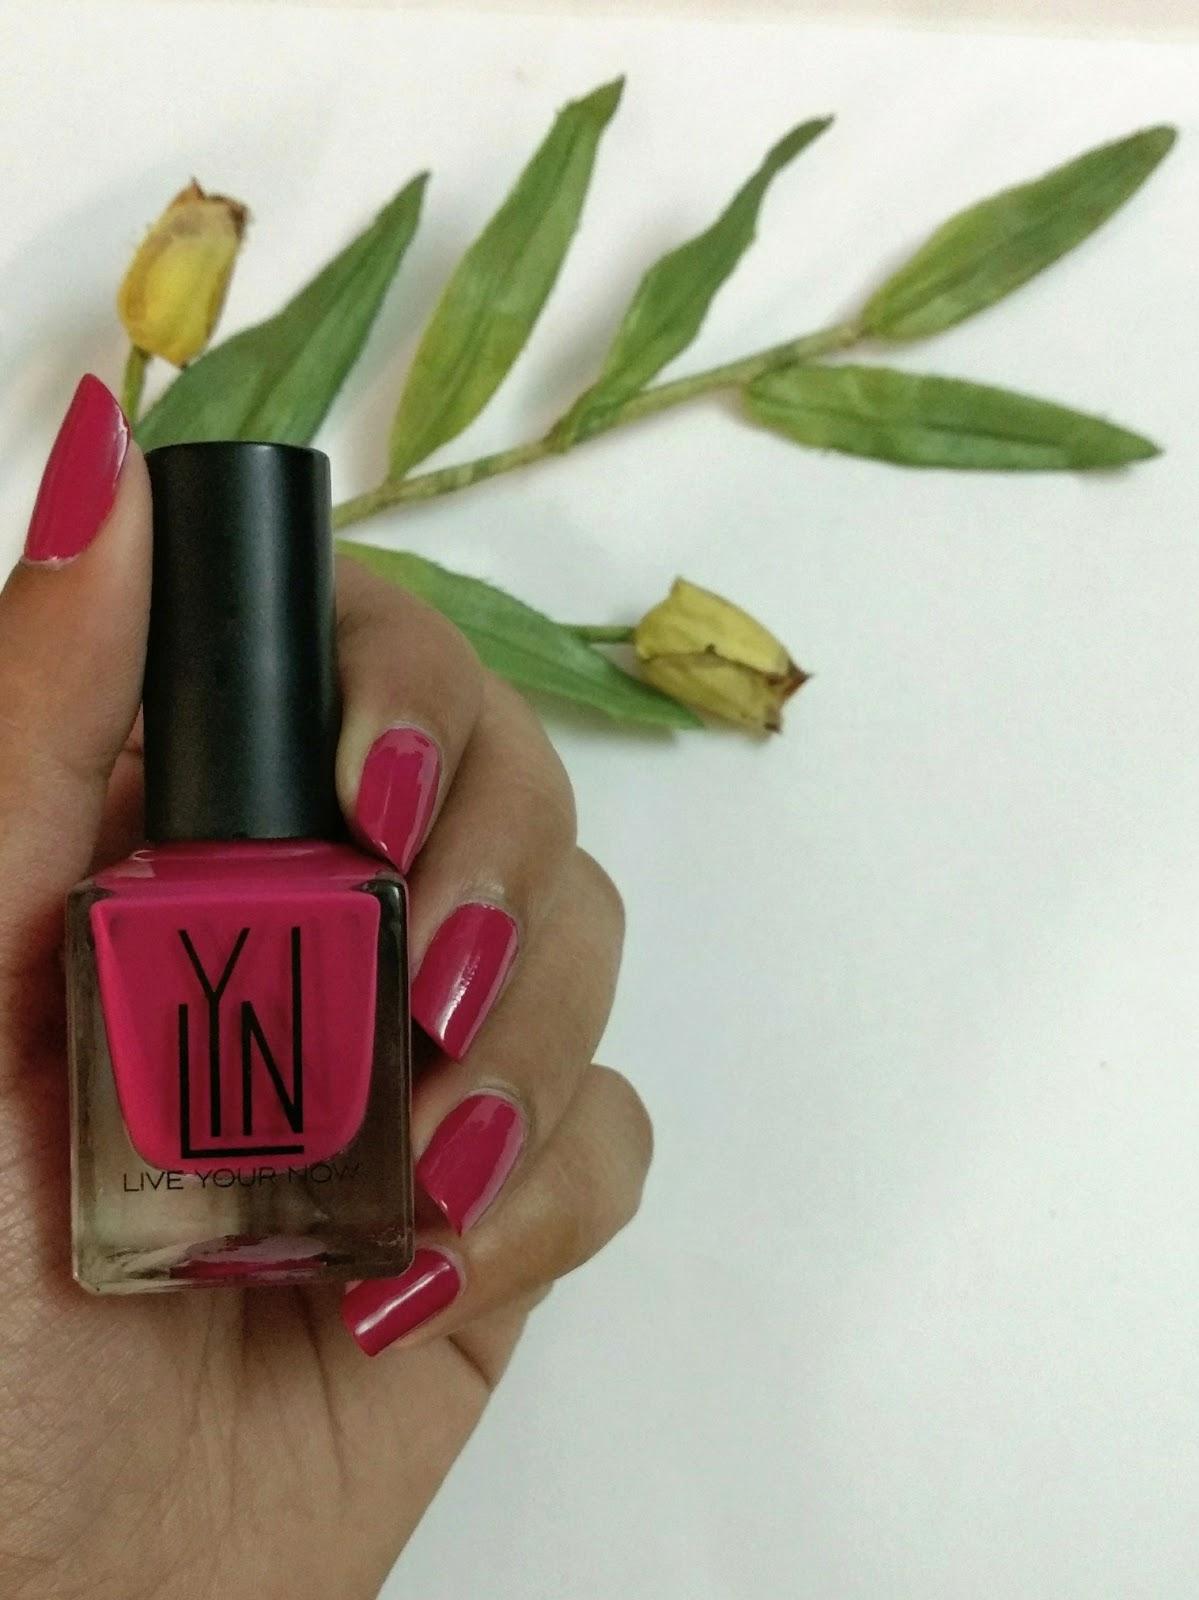 Glitz, Glamor u0026 Grace.: Product Review - Live Your Now ( LYN ) Nail Enamel - Didya Vinka At Me #465